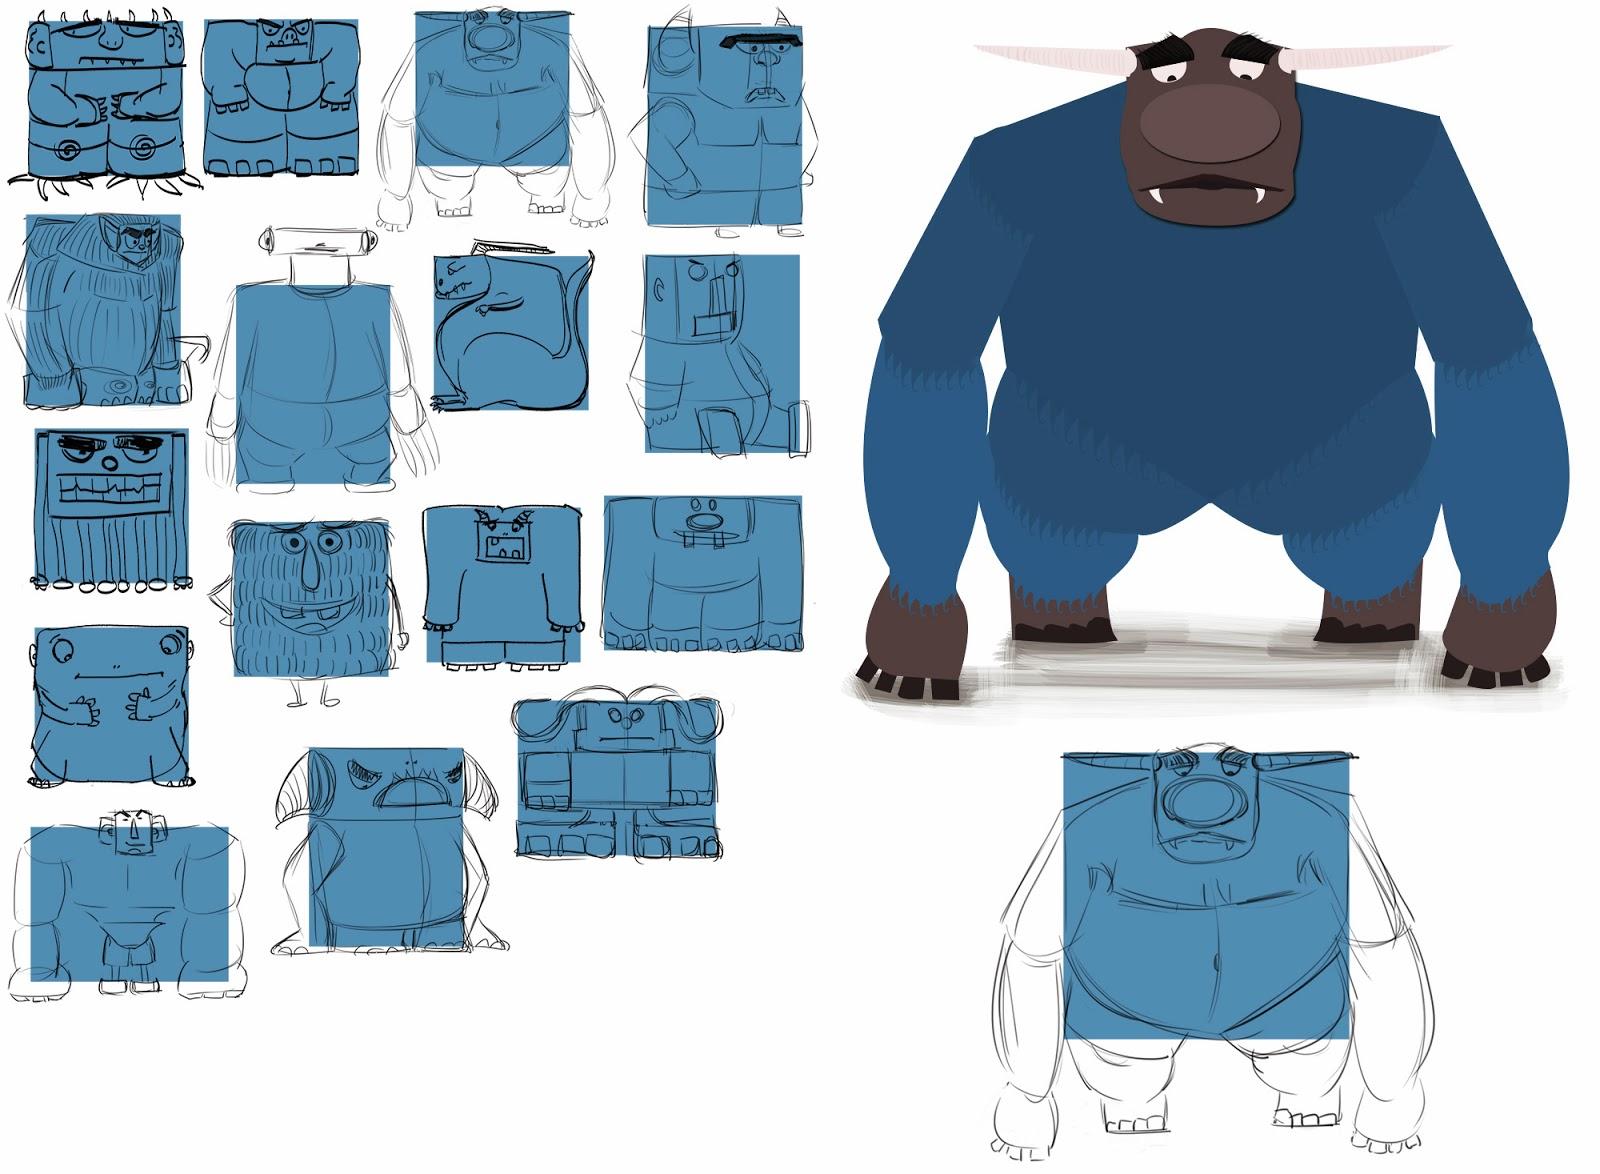 Character Design Class : Nikki s sketches character design class week